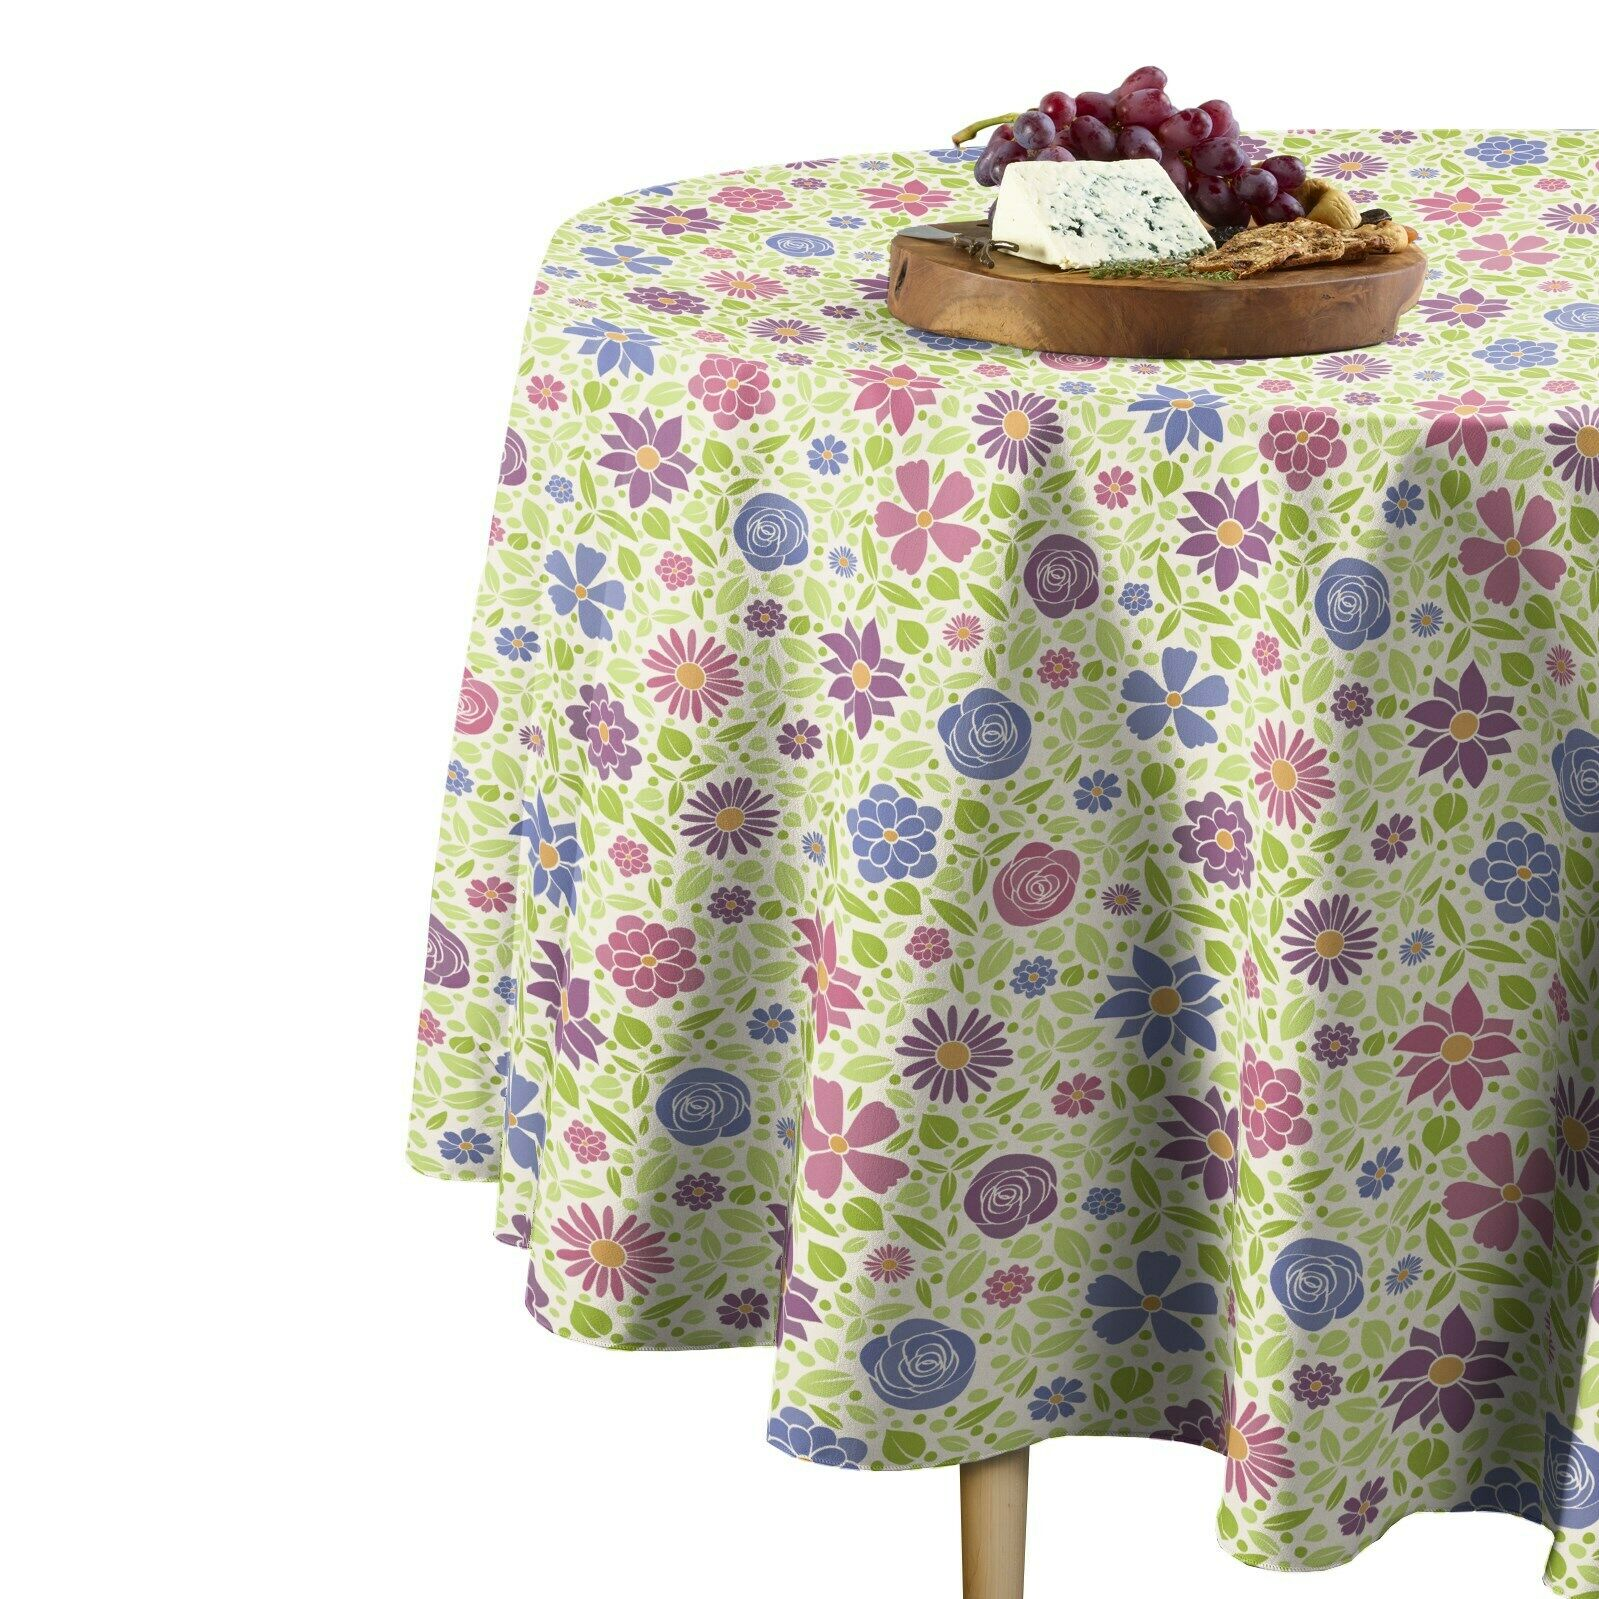 Pastel Floral Signature Round Tablecloth Assorted Größes